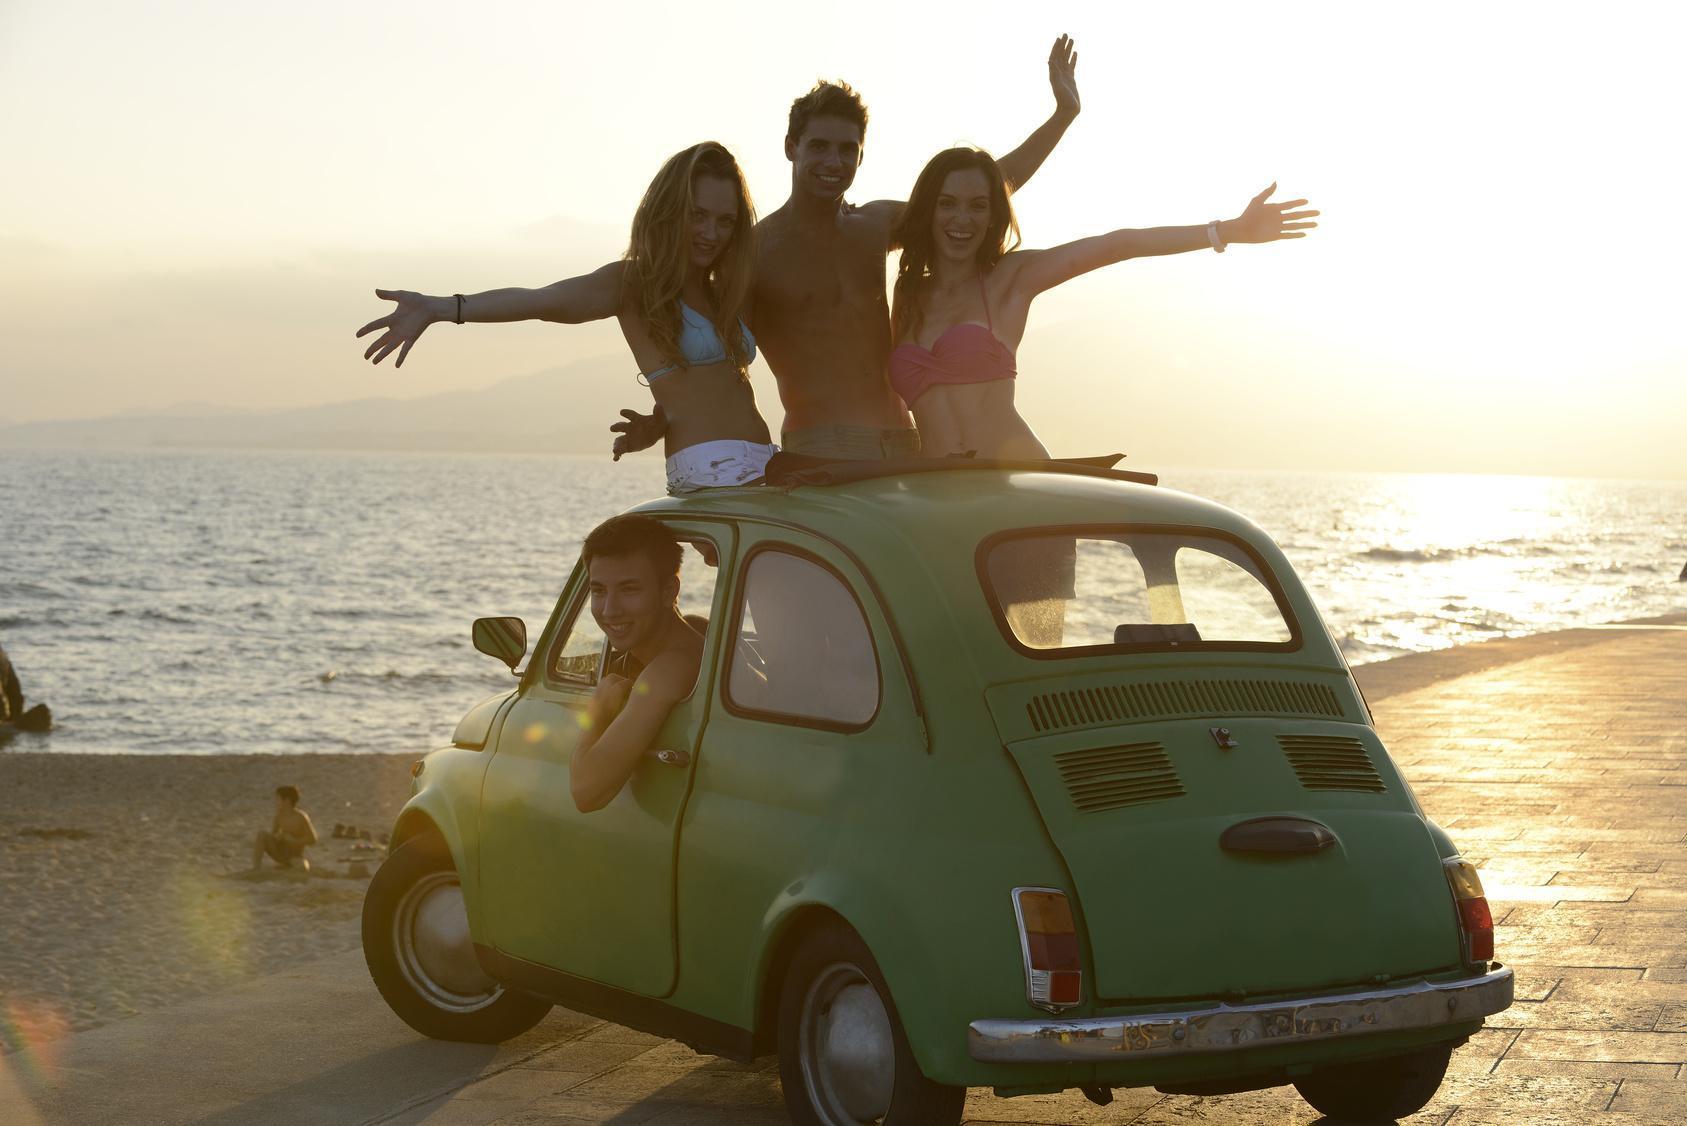 ofertas-para-alugar-carros-09-03-17